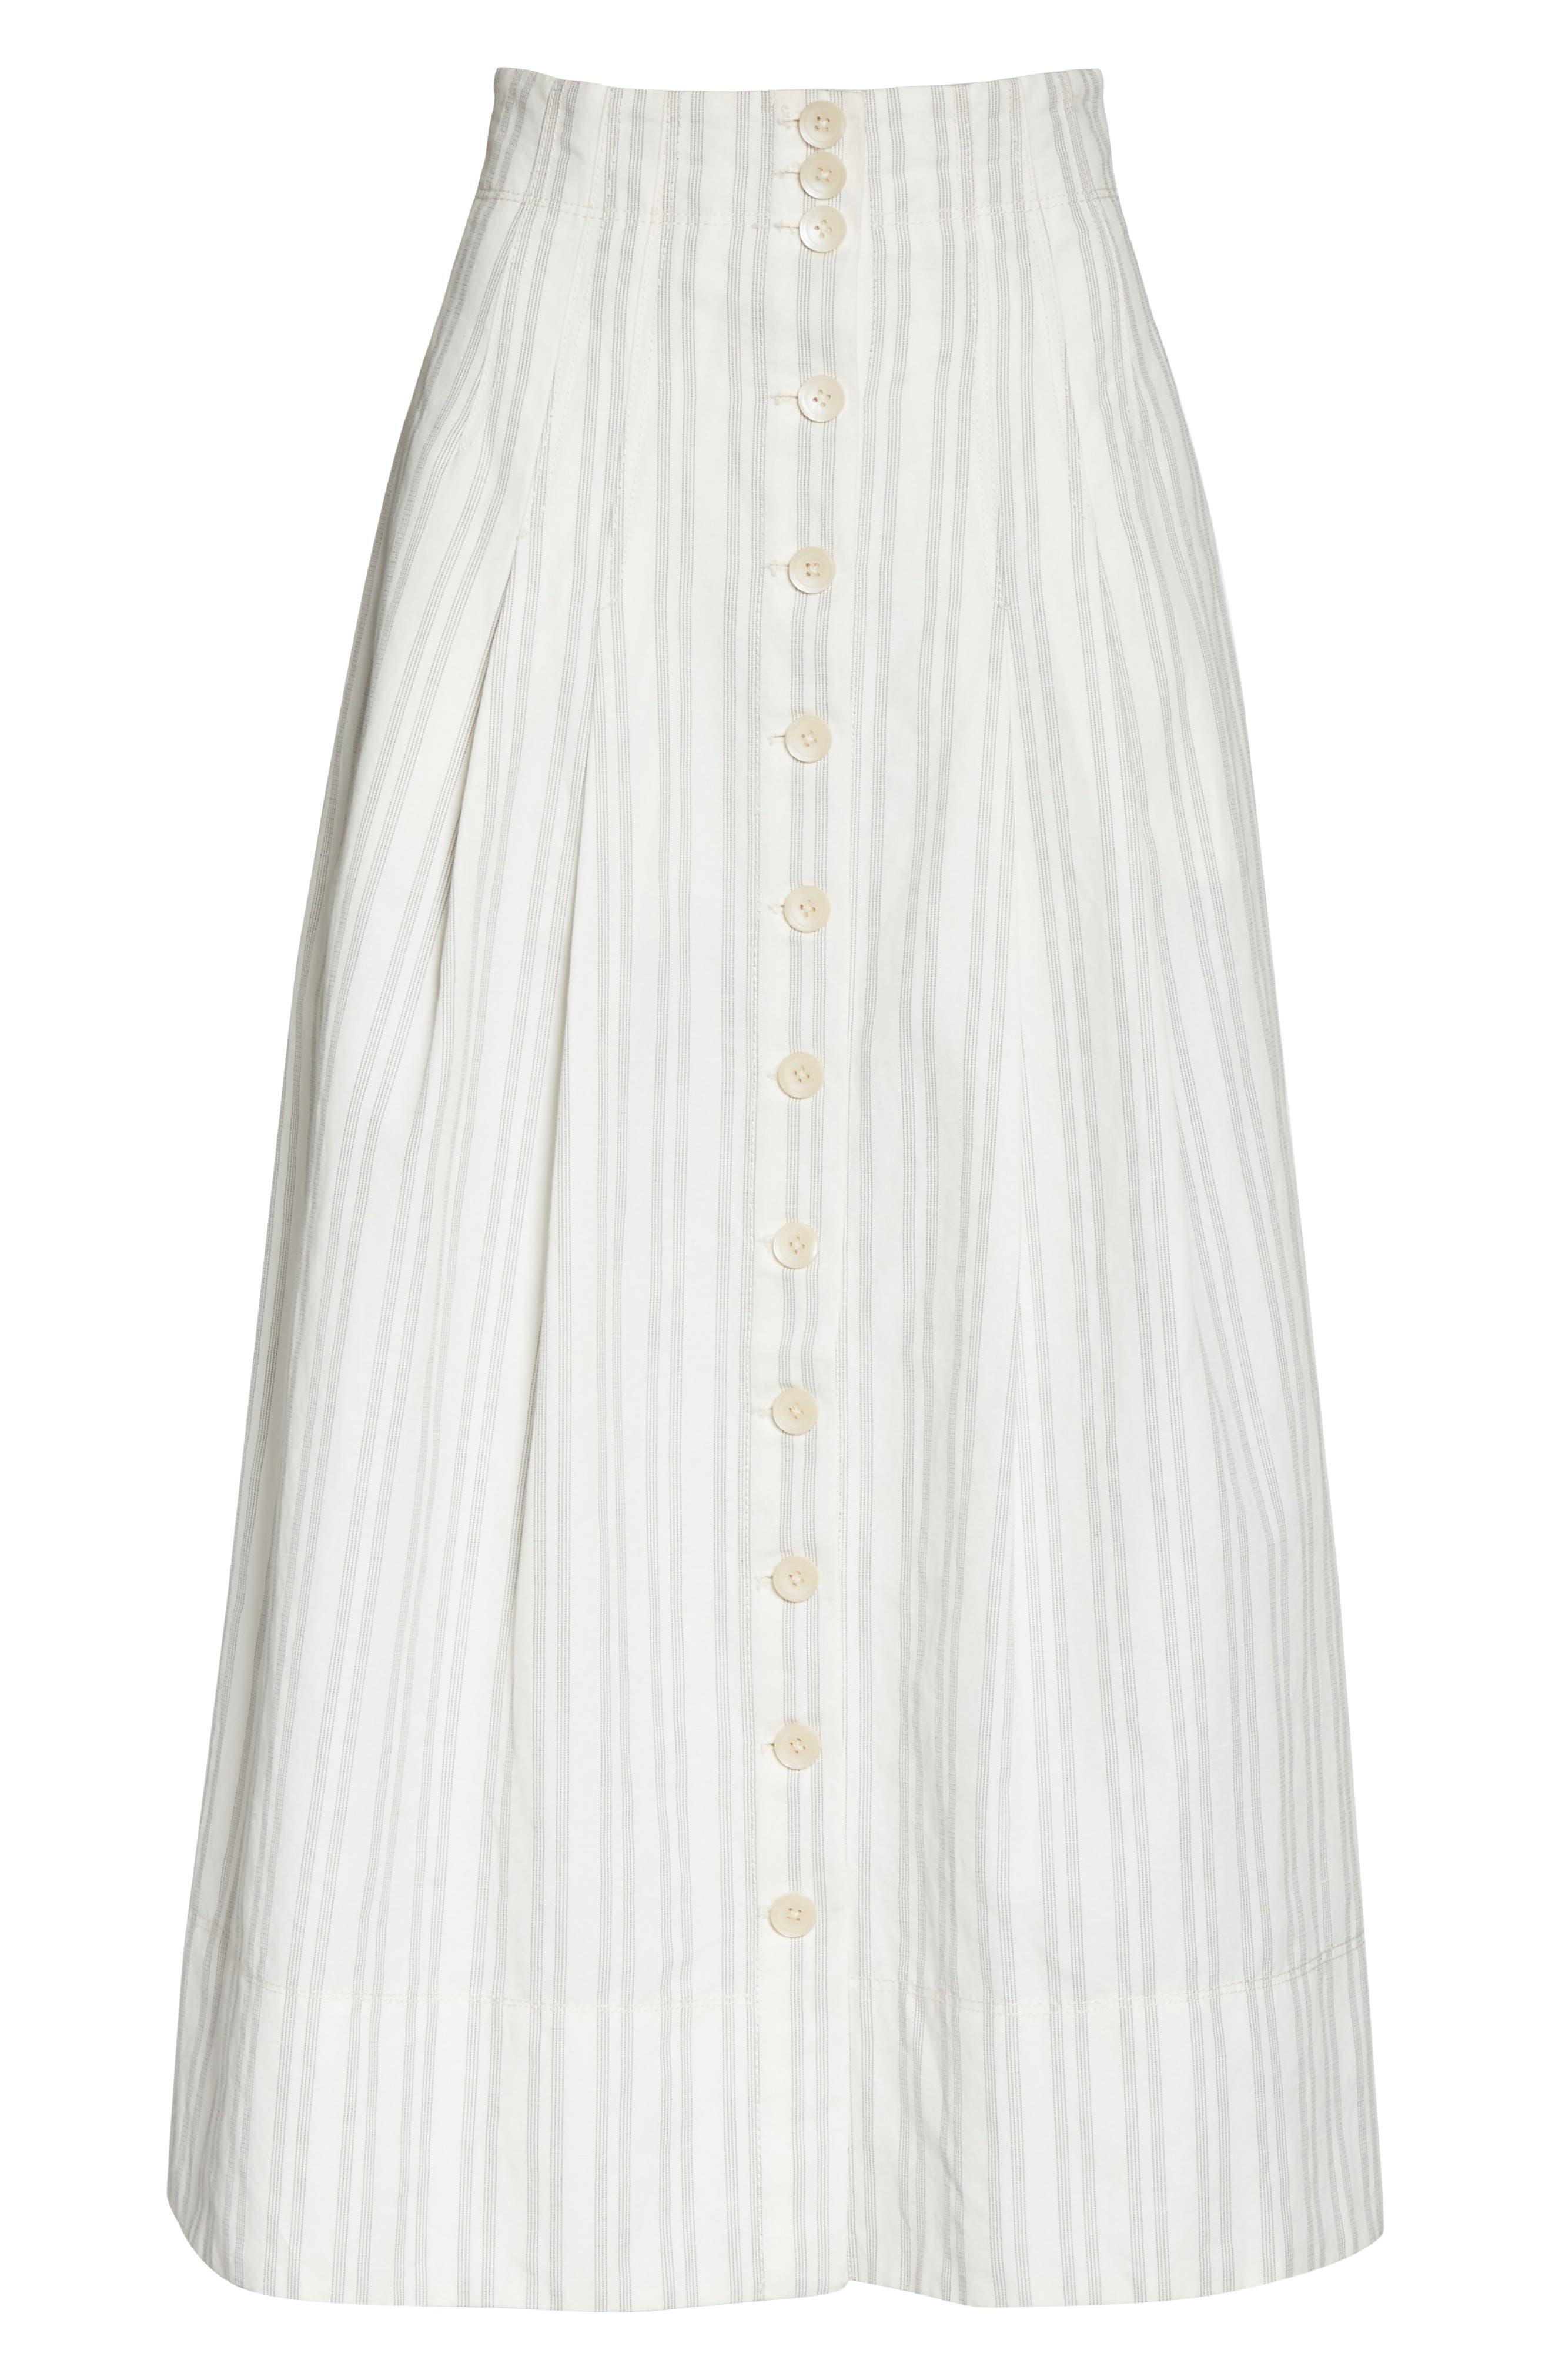 Stripe Midi Skirt,                             Alternate thumbnail 6, color,                             199